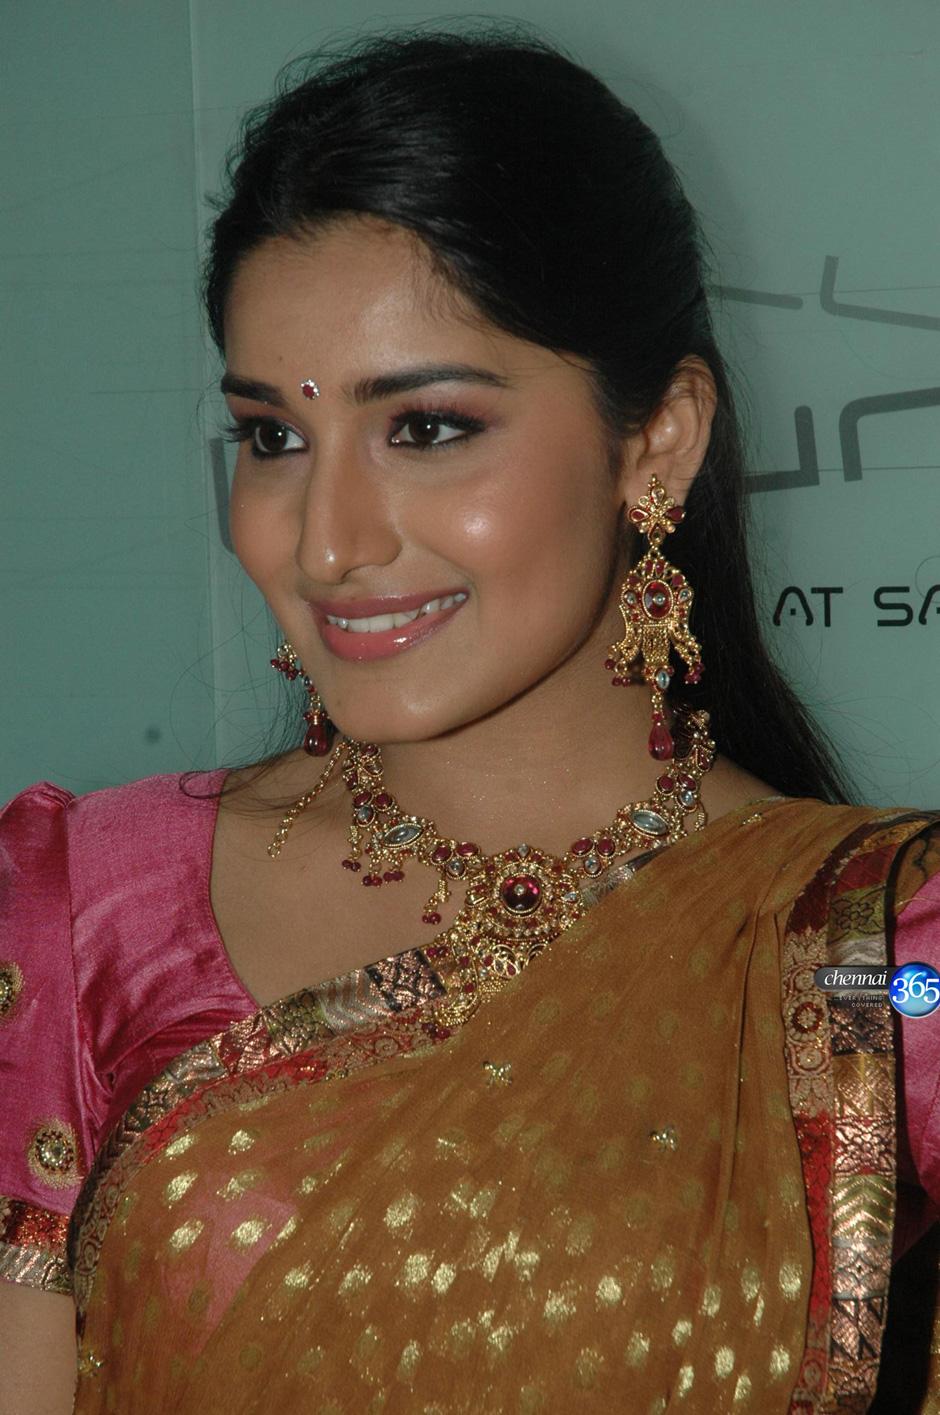 Wallpaper World: Beautiful Indian Girl in Pink Saree